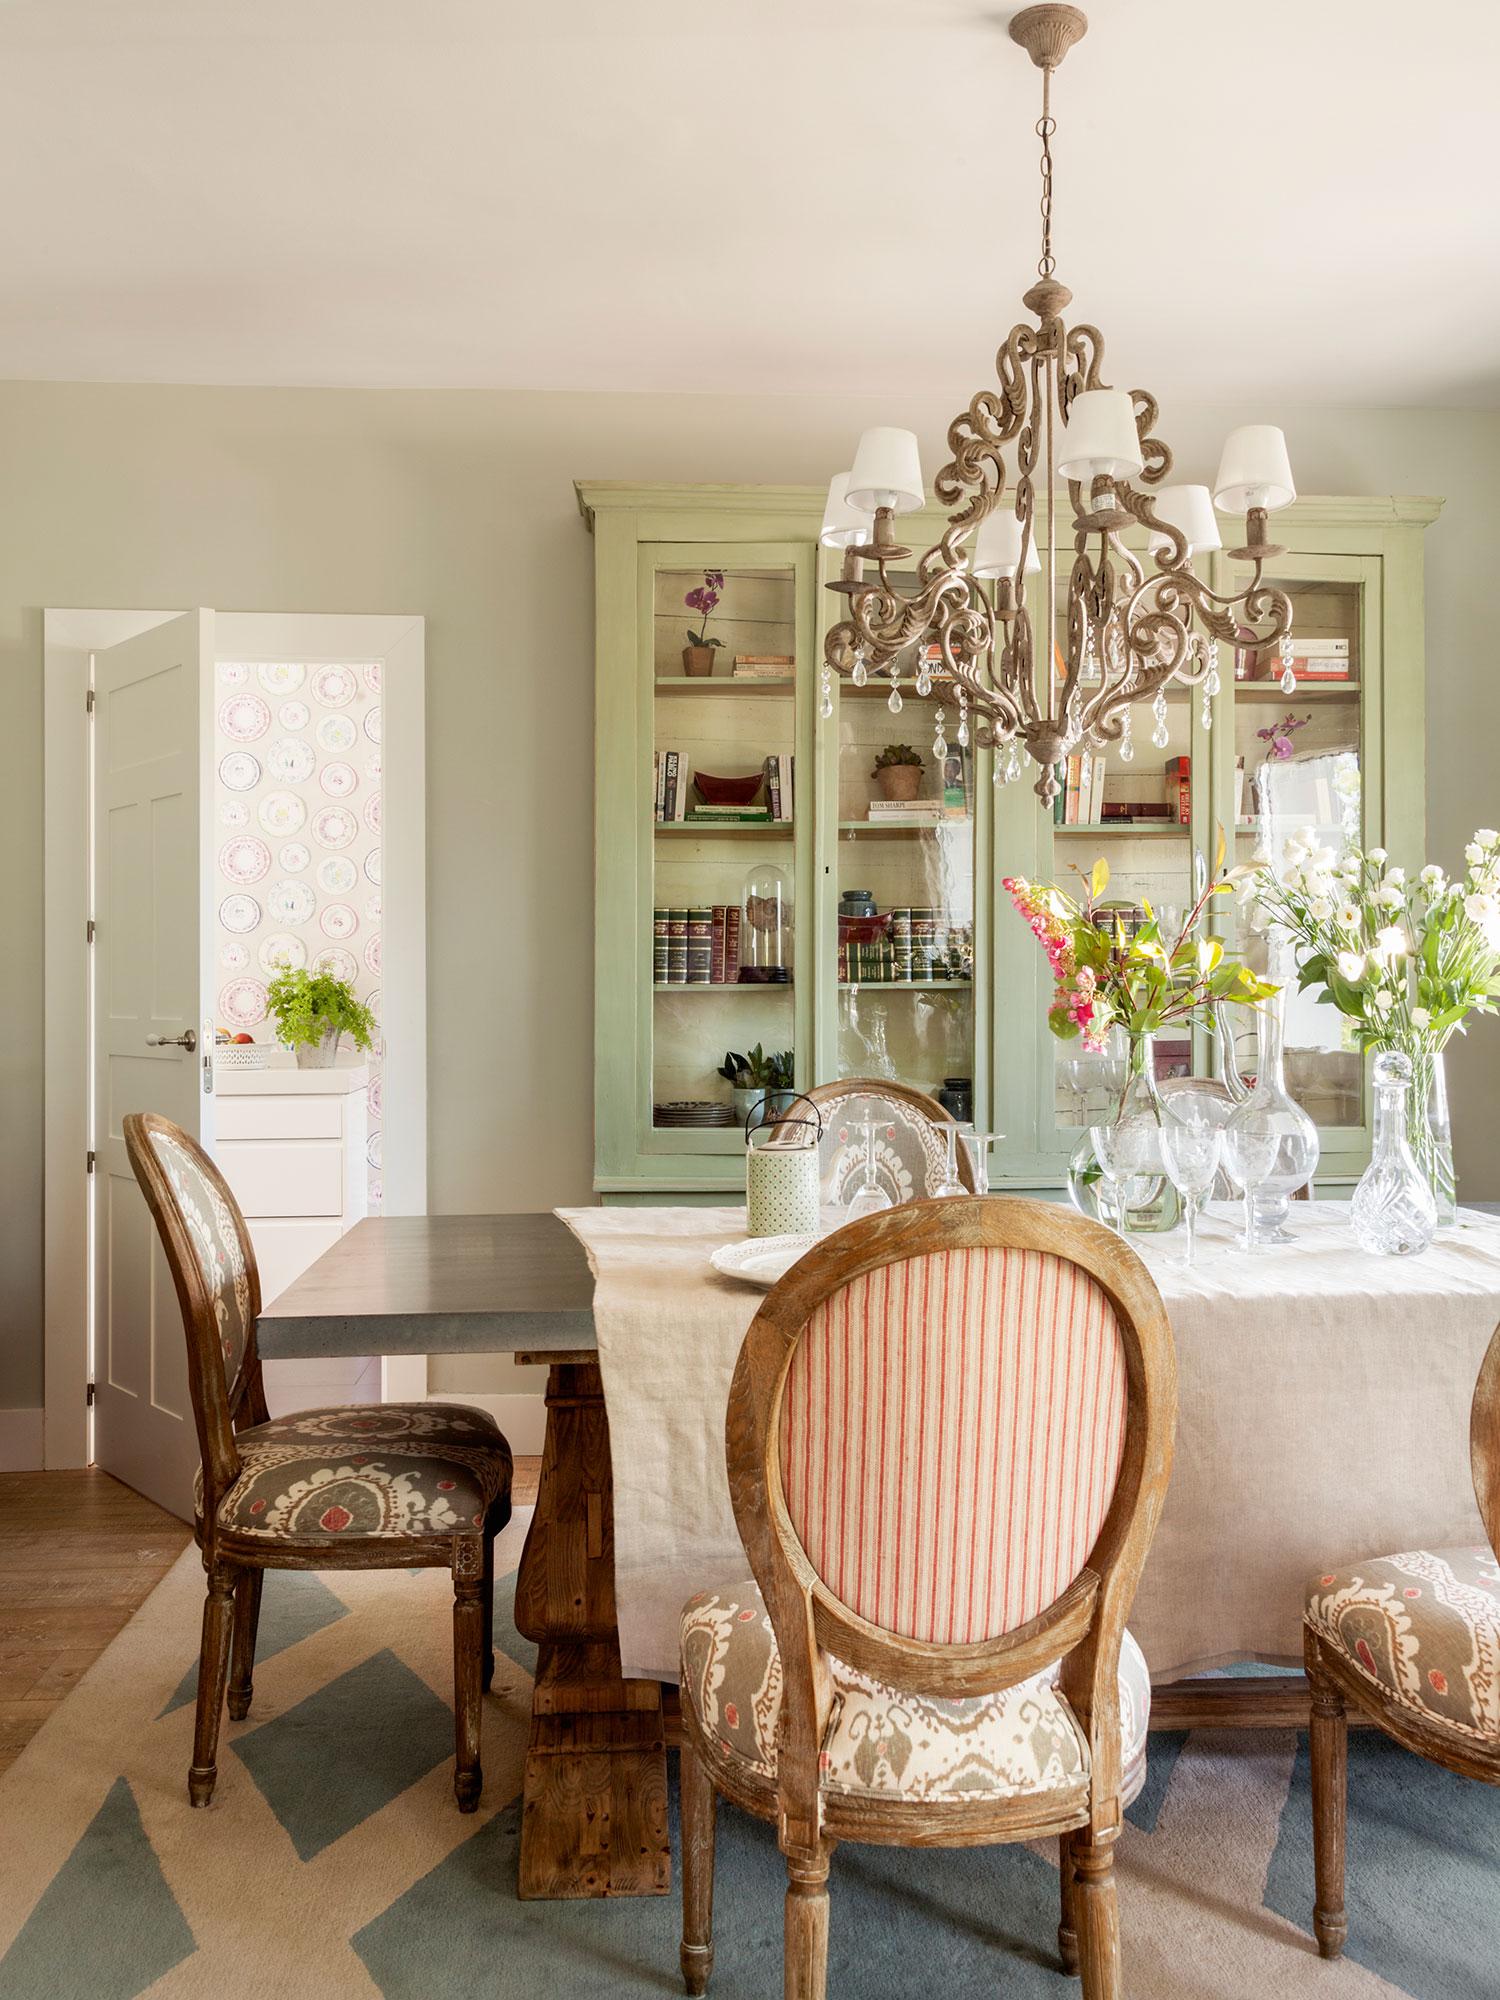 Decorar con flores 12 ideas para vestir tu casa de primavera for Sillas comedor clasicas tapizadas